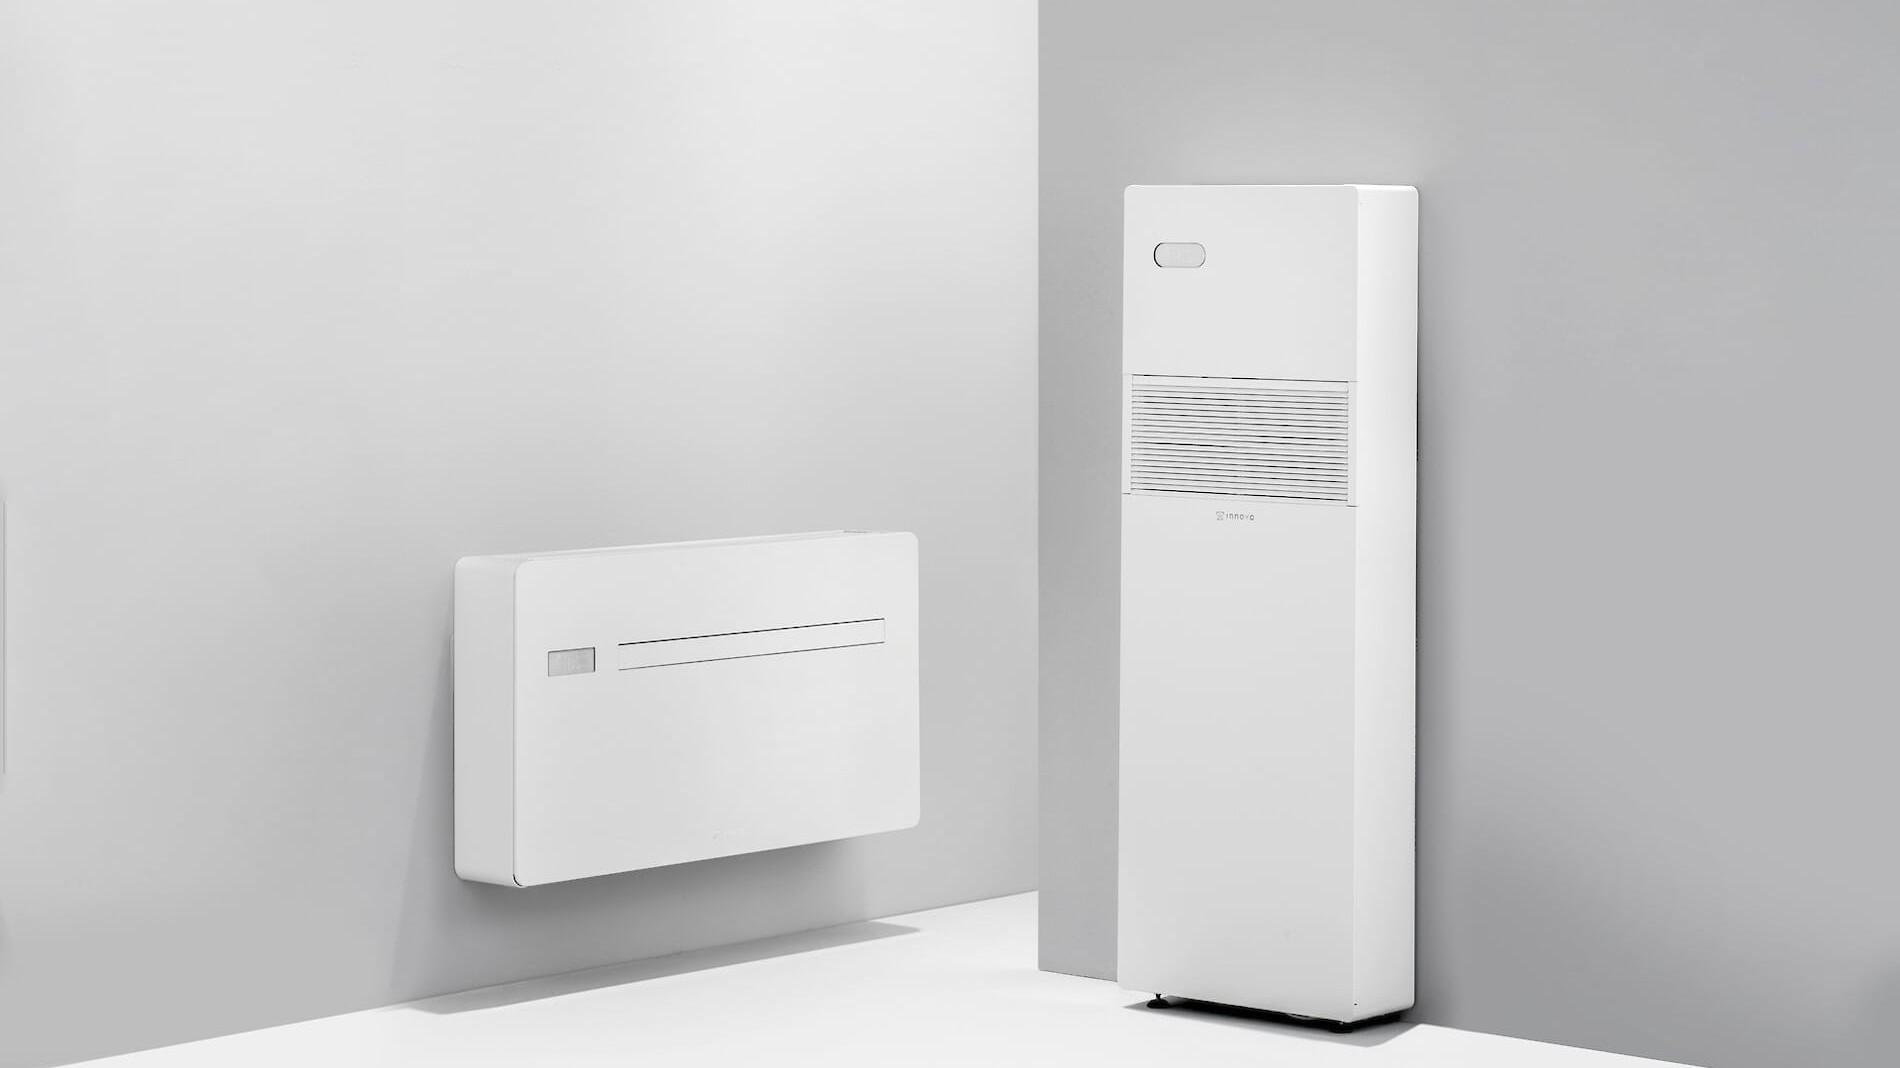 Green House Solutions zonnepanelen batterijopslag laadpalen airconditioning massima versatilita.1900x0